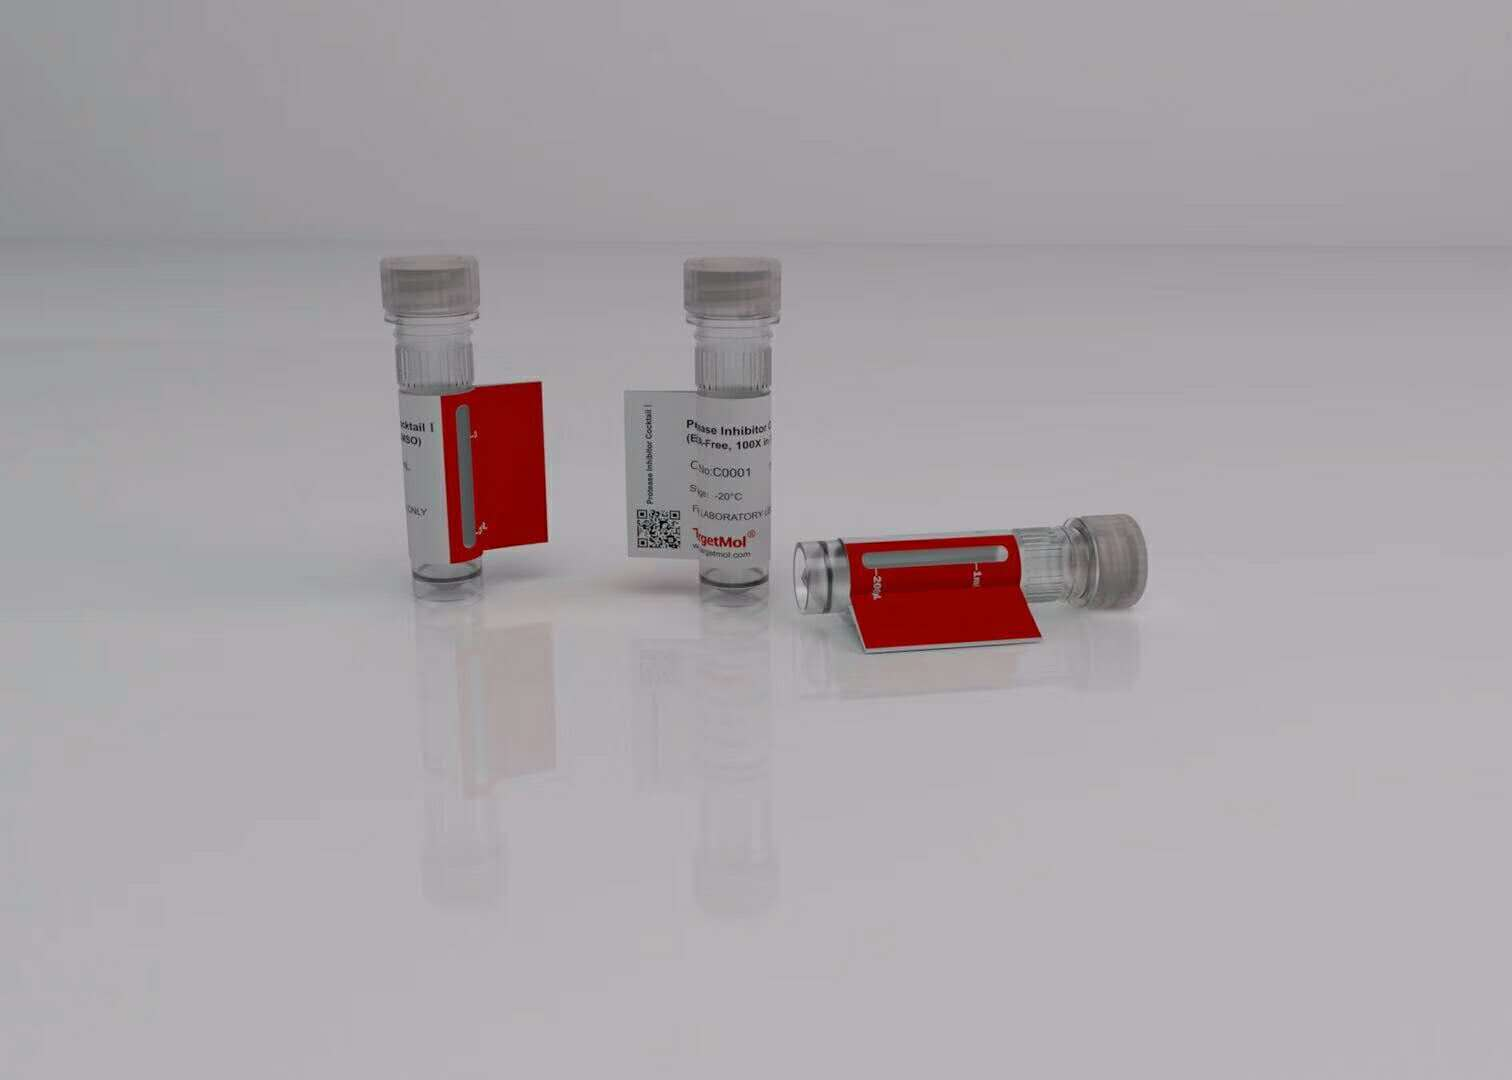 蛋白酶抑制剂Cocktail